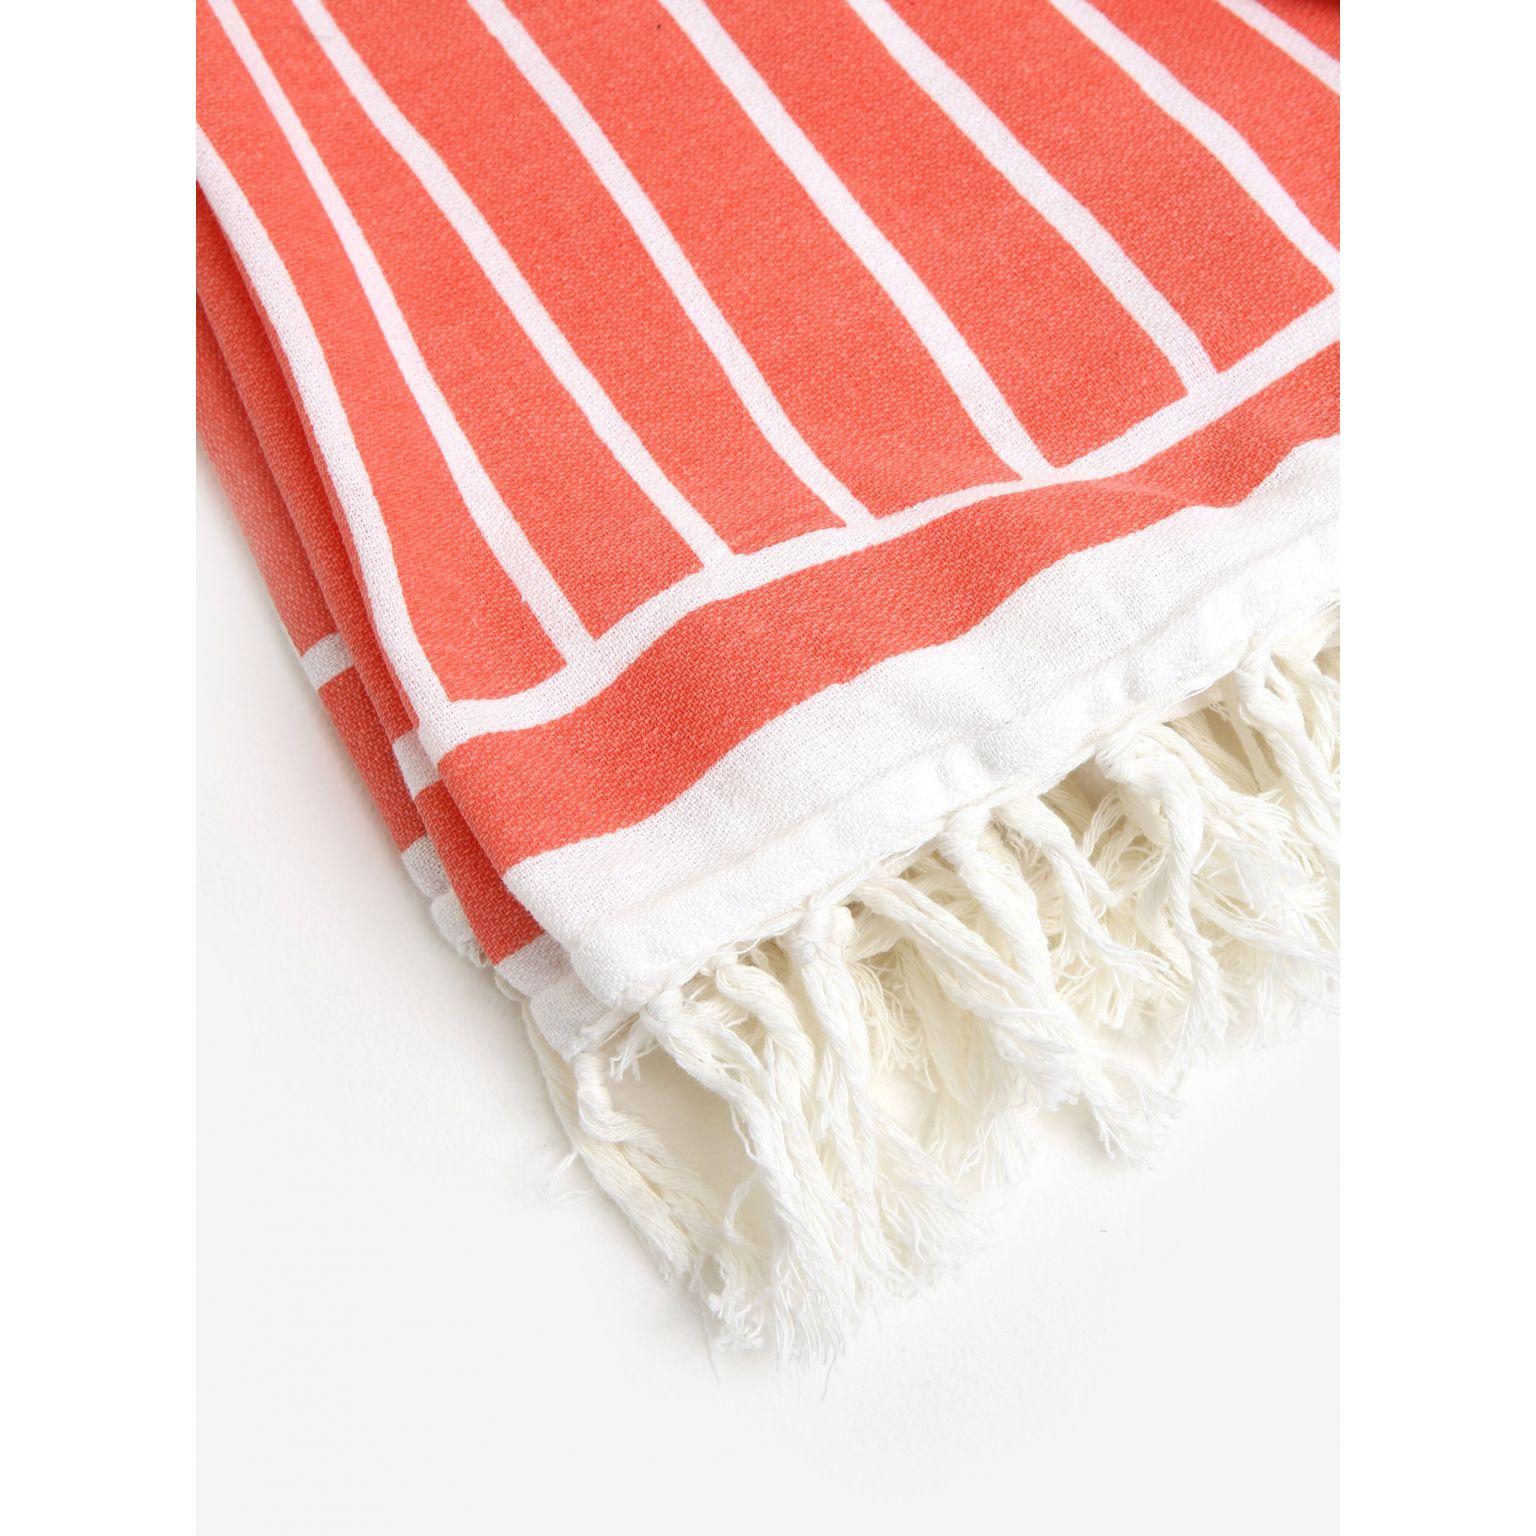 Decoris Home Hammam Towel - Bourne Valley Garden Centre on Decoris Outdoor Living id=19446